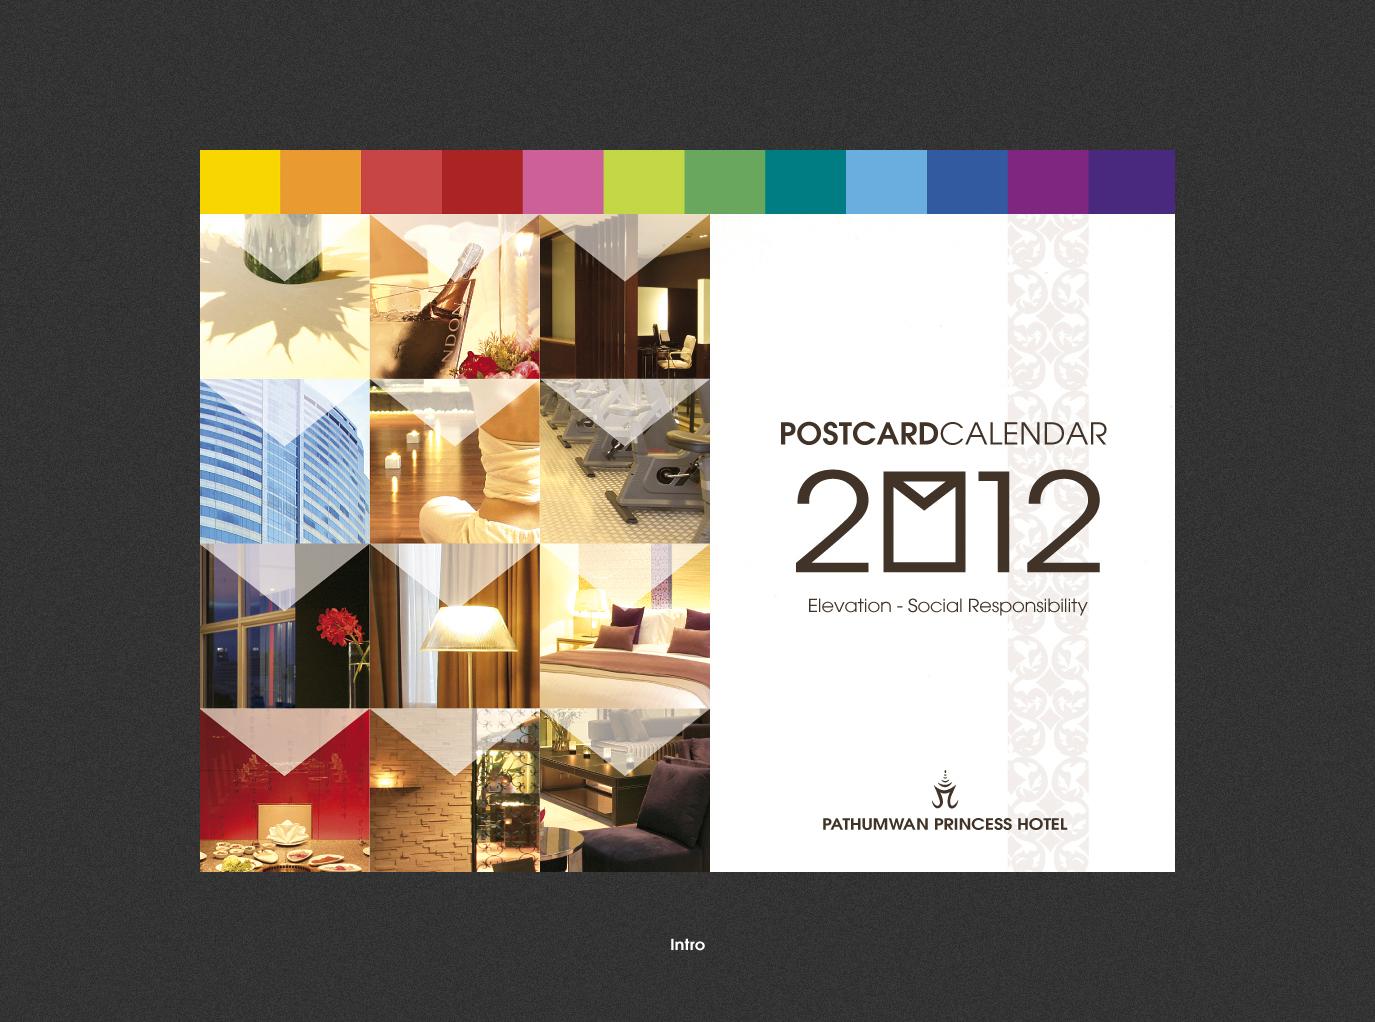 Hotel Calendar Design : Hotel postcard calendar krisada wong